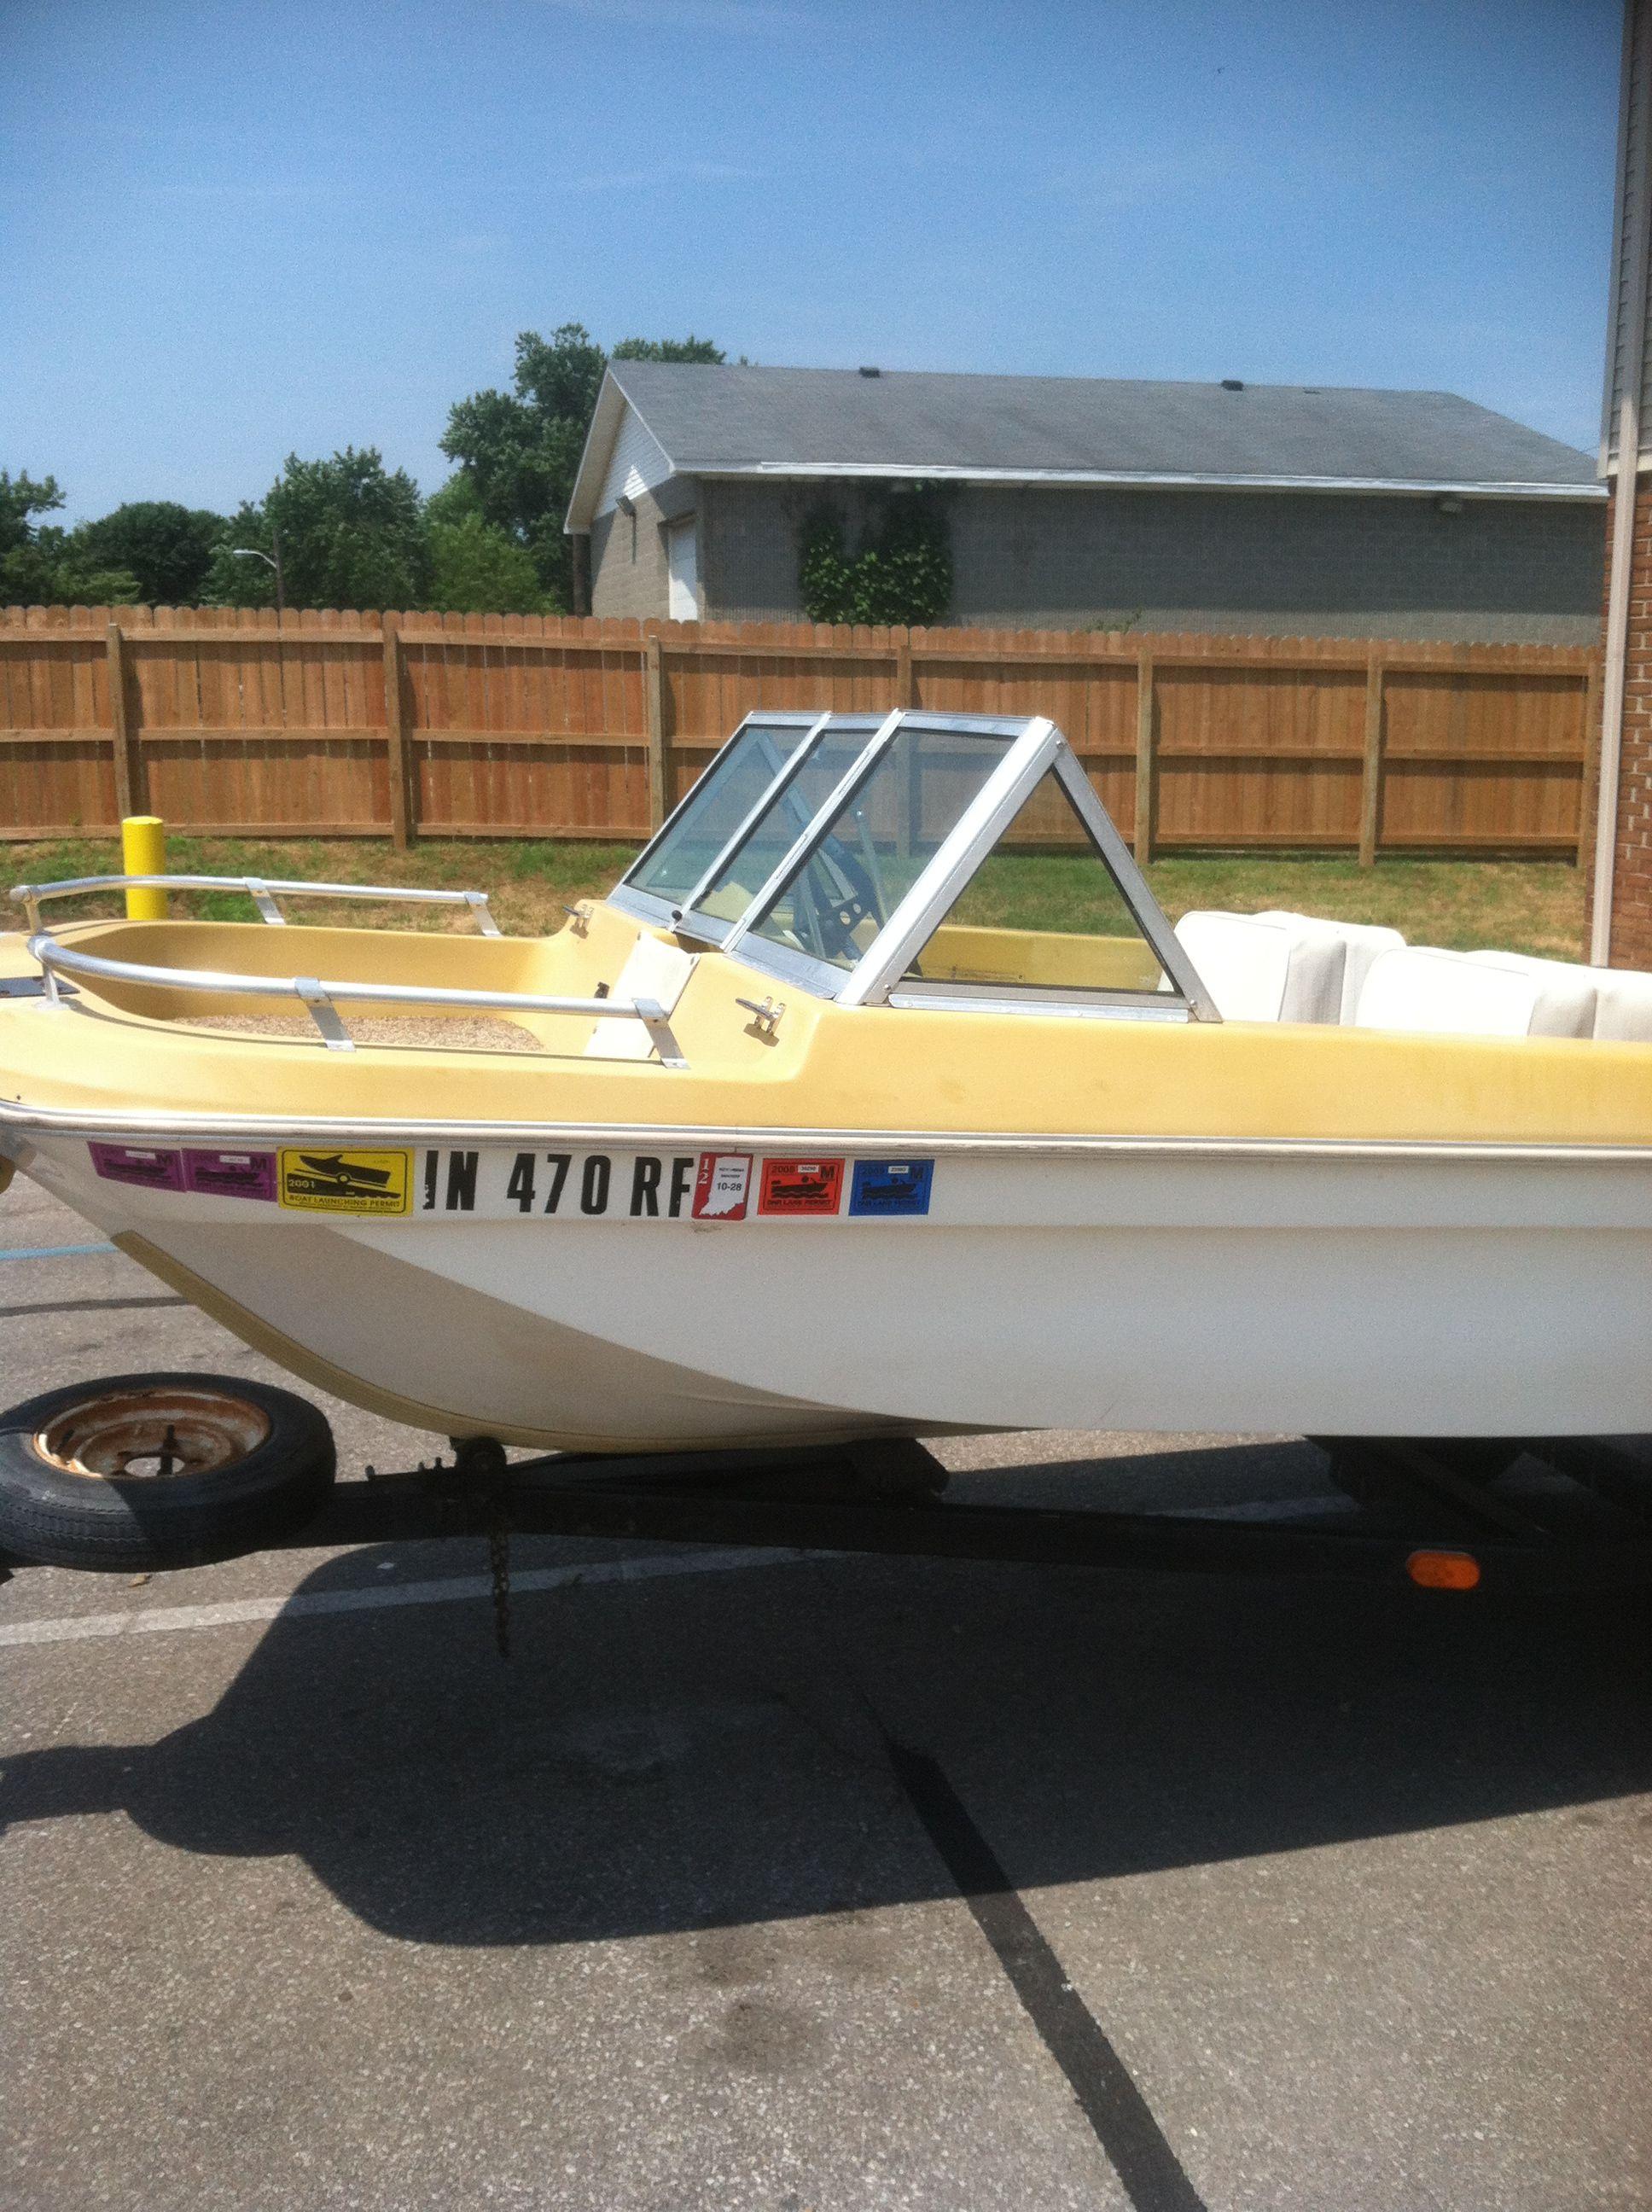 14 Beecraft Boat In Cokedog S Garage Sale Angola In Garage Sale